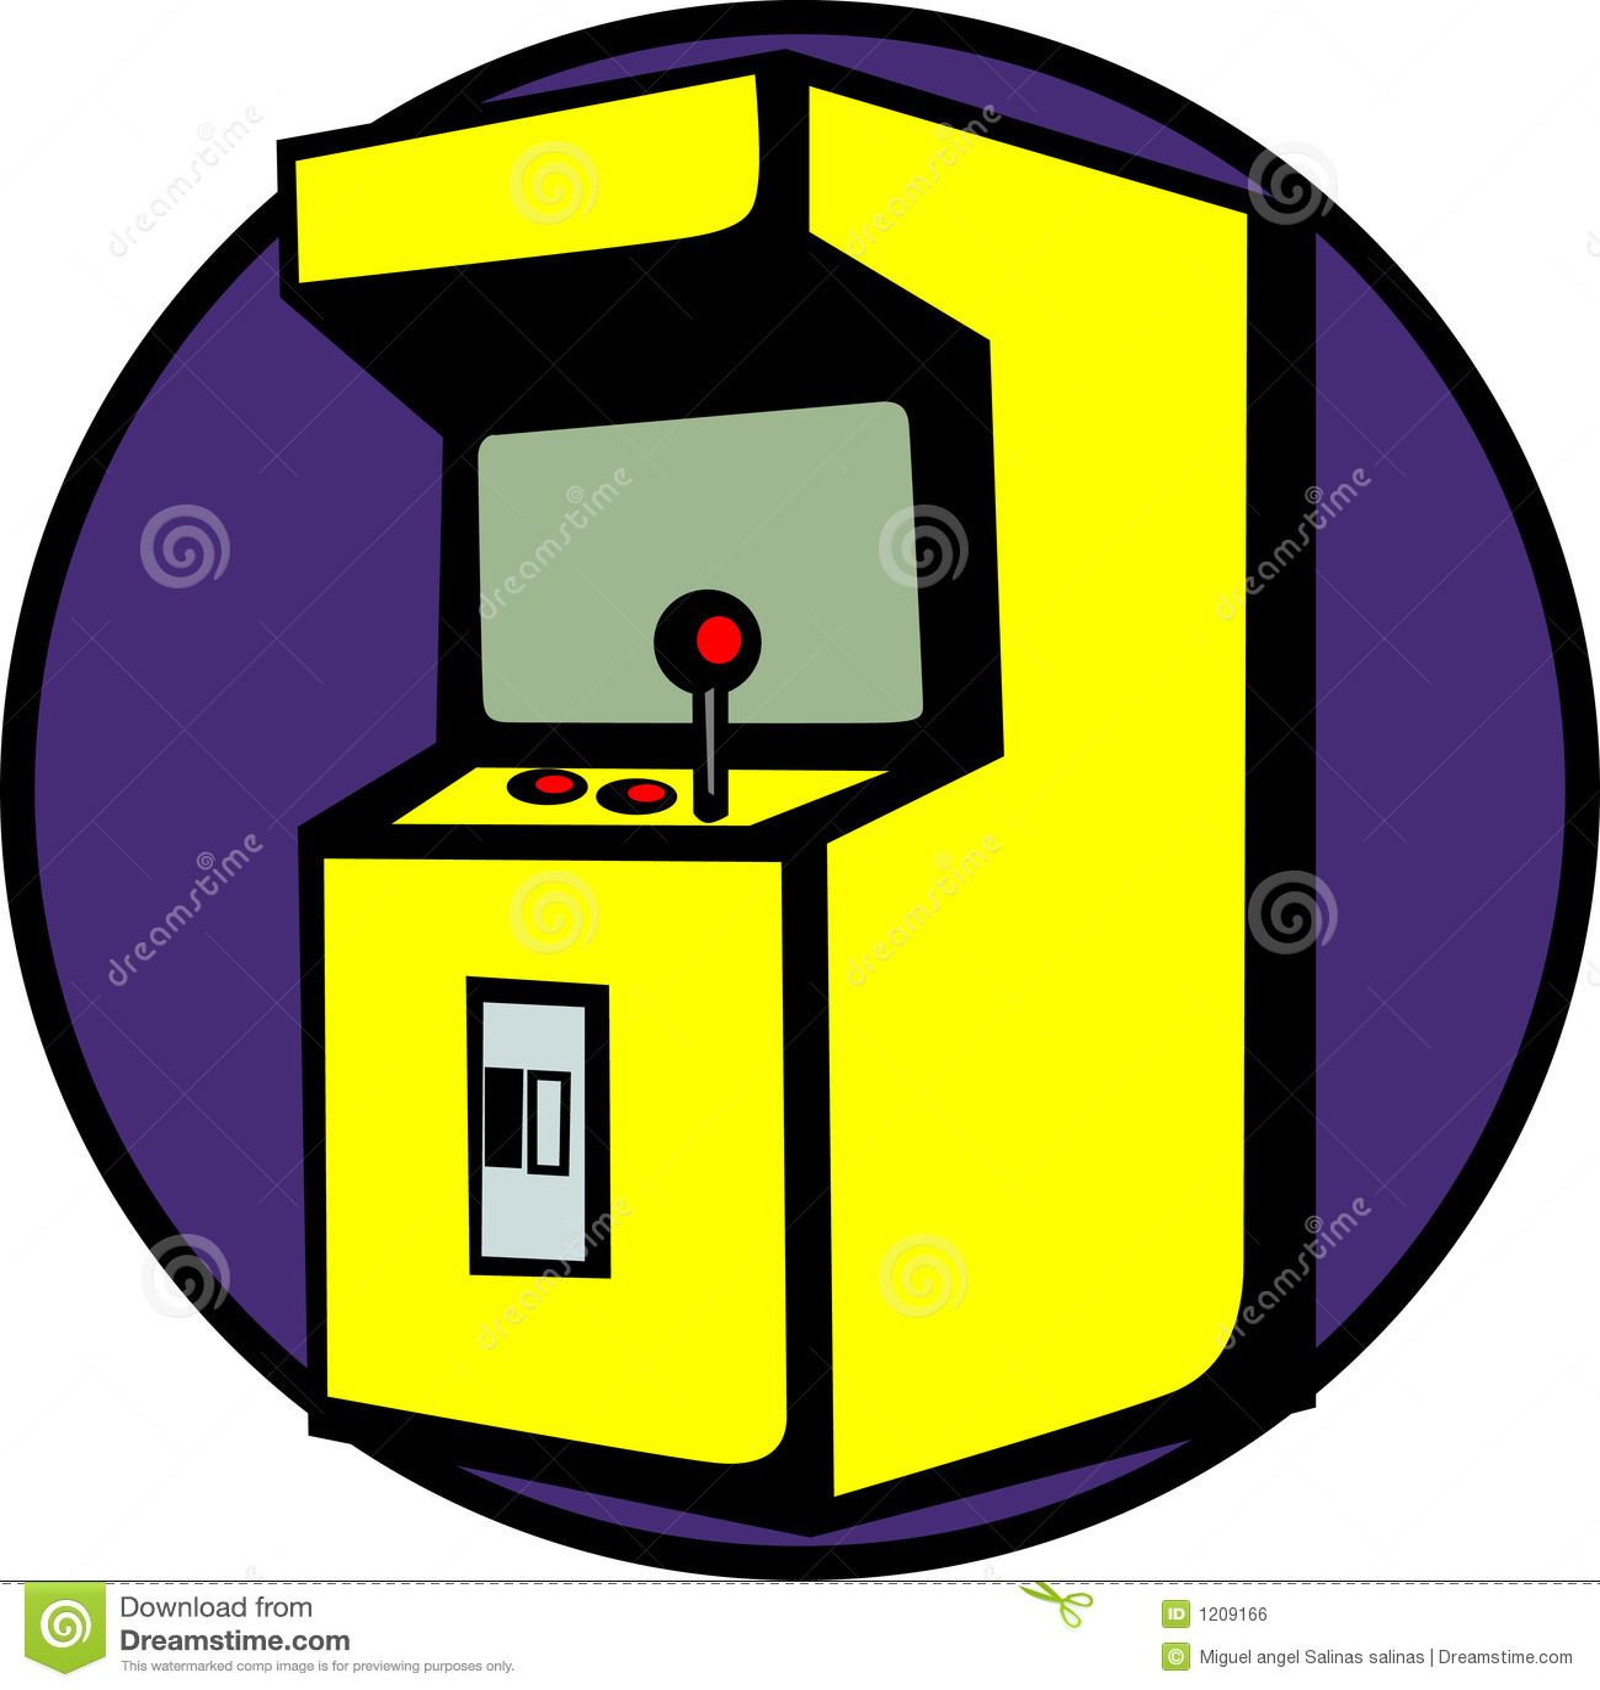 Videogame Arcade Machine Vector Illustration Royalty Free